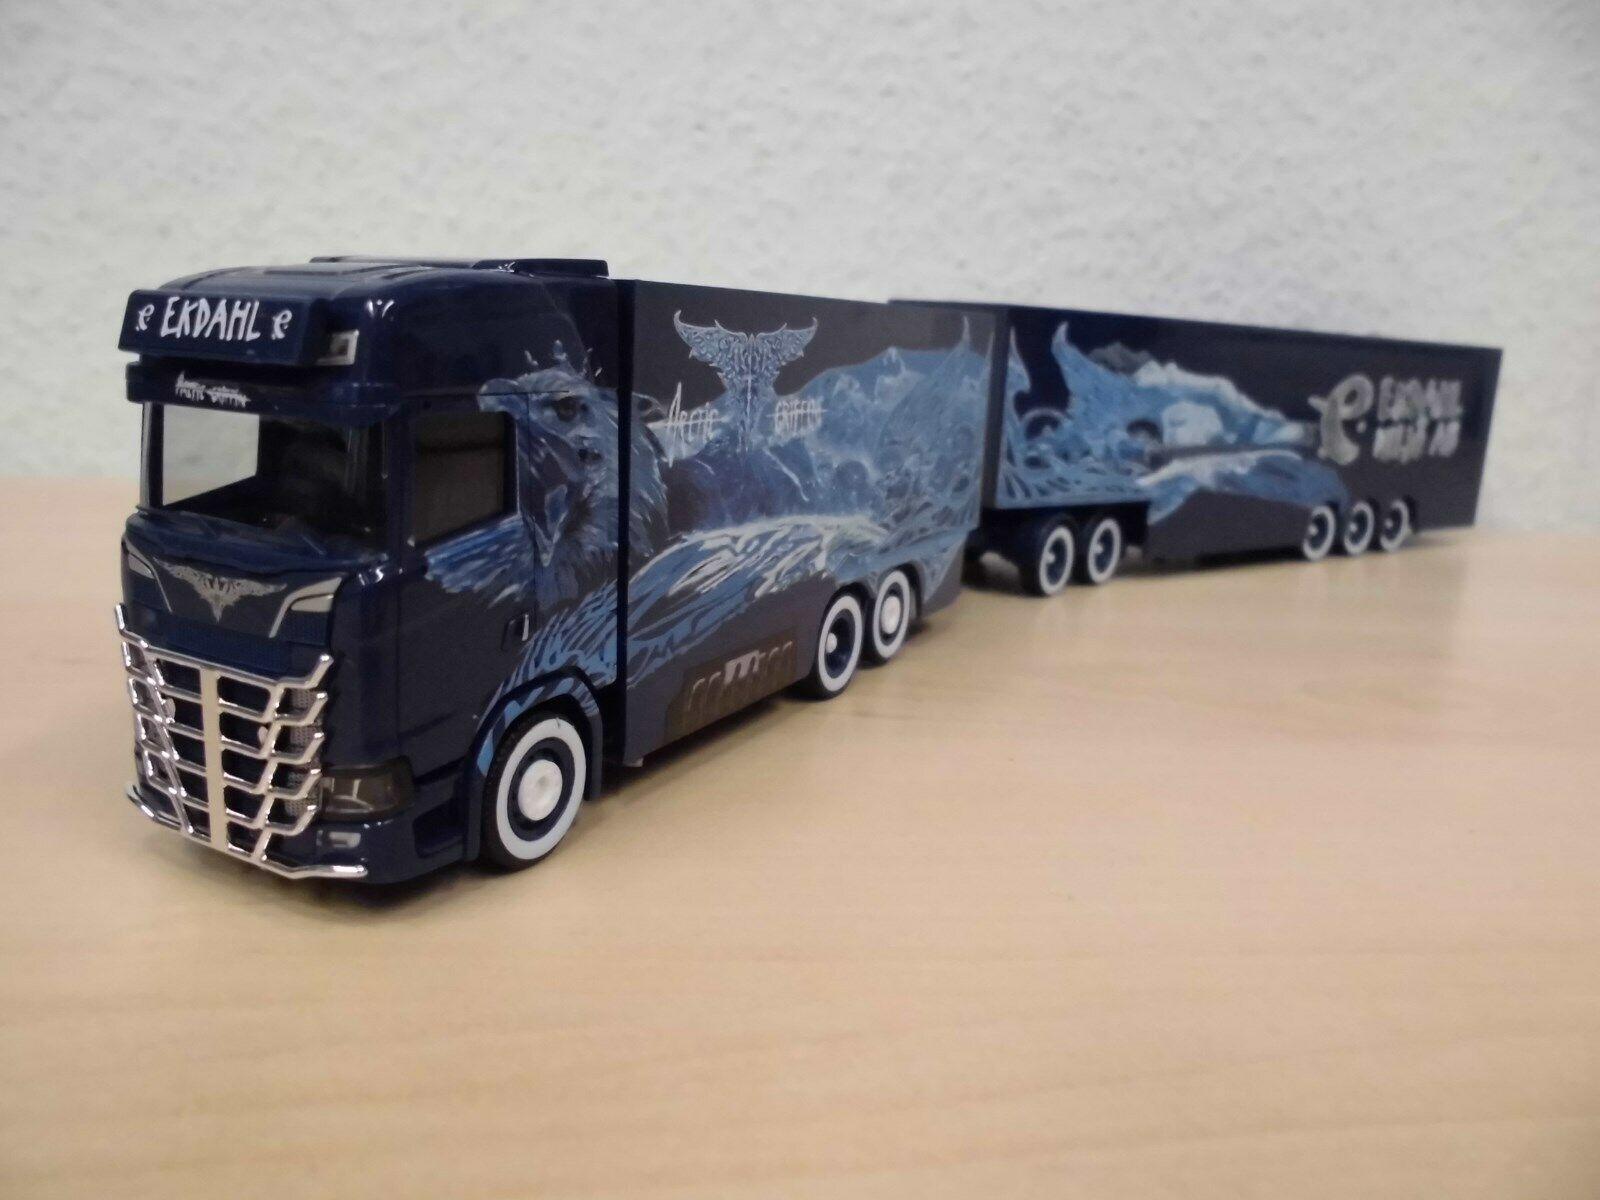 Herpa-Scania CS megatráileres EuroCombi  Ekdahl Arctic Griffin  - 307864 -1 87